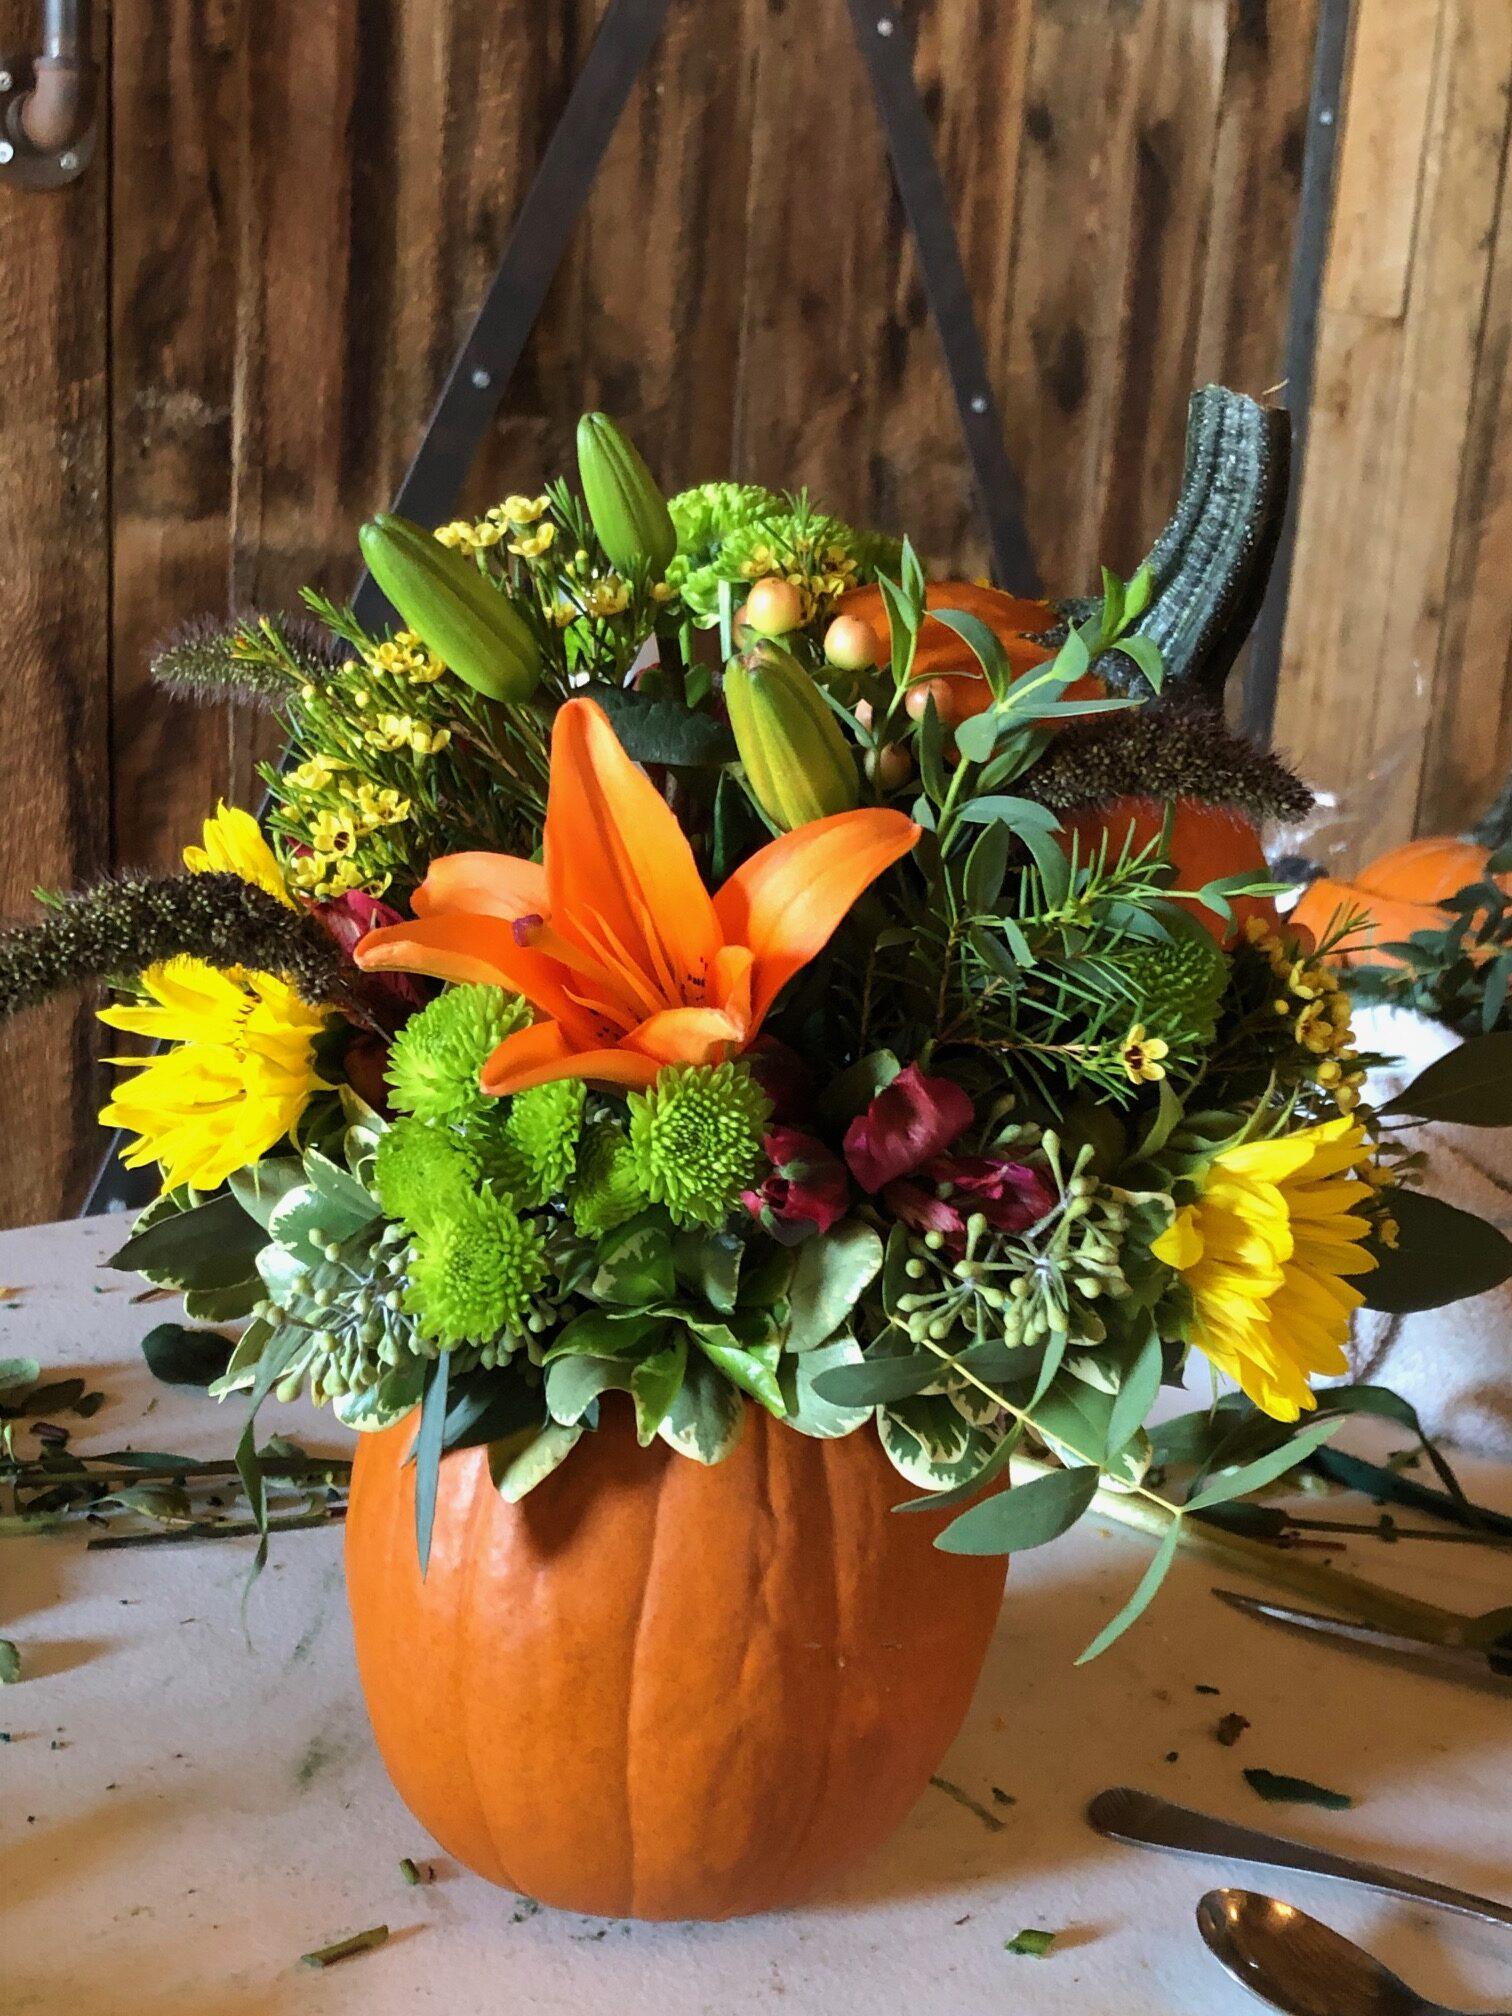 Sunflowers & Pumpkins Fall Floral Design Workshop